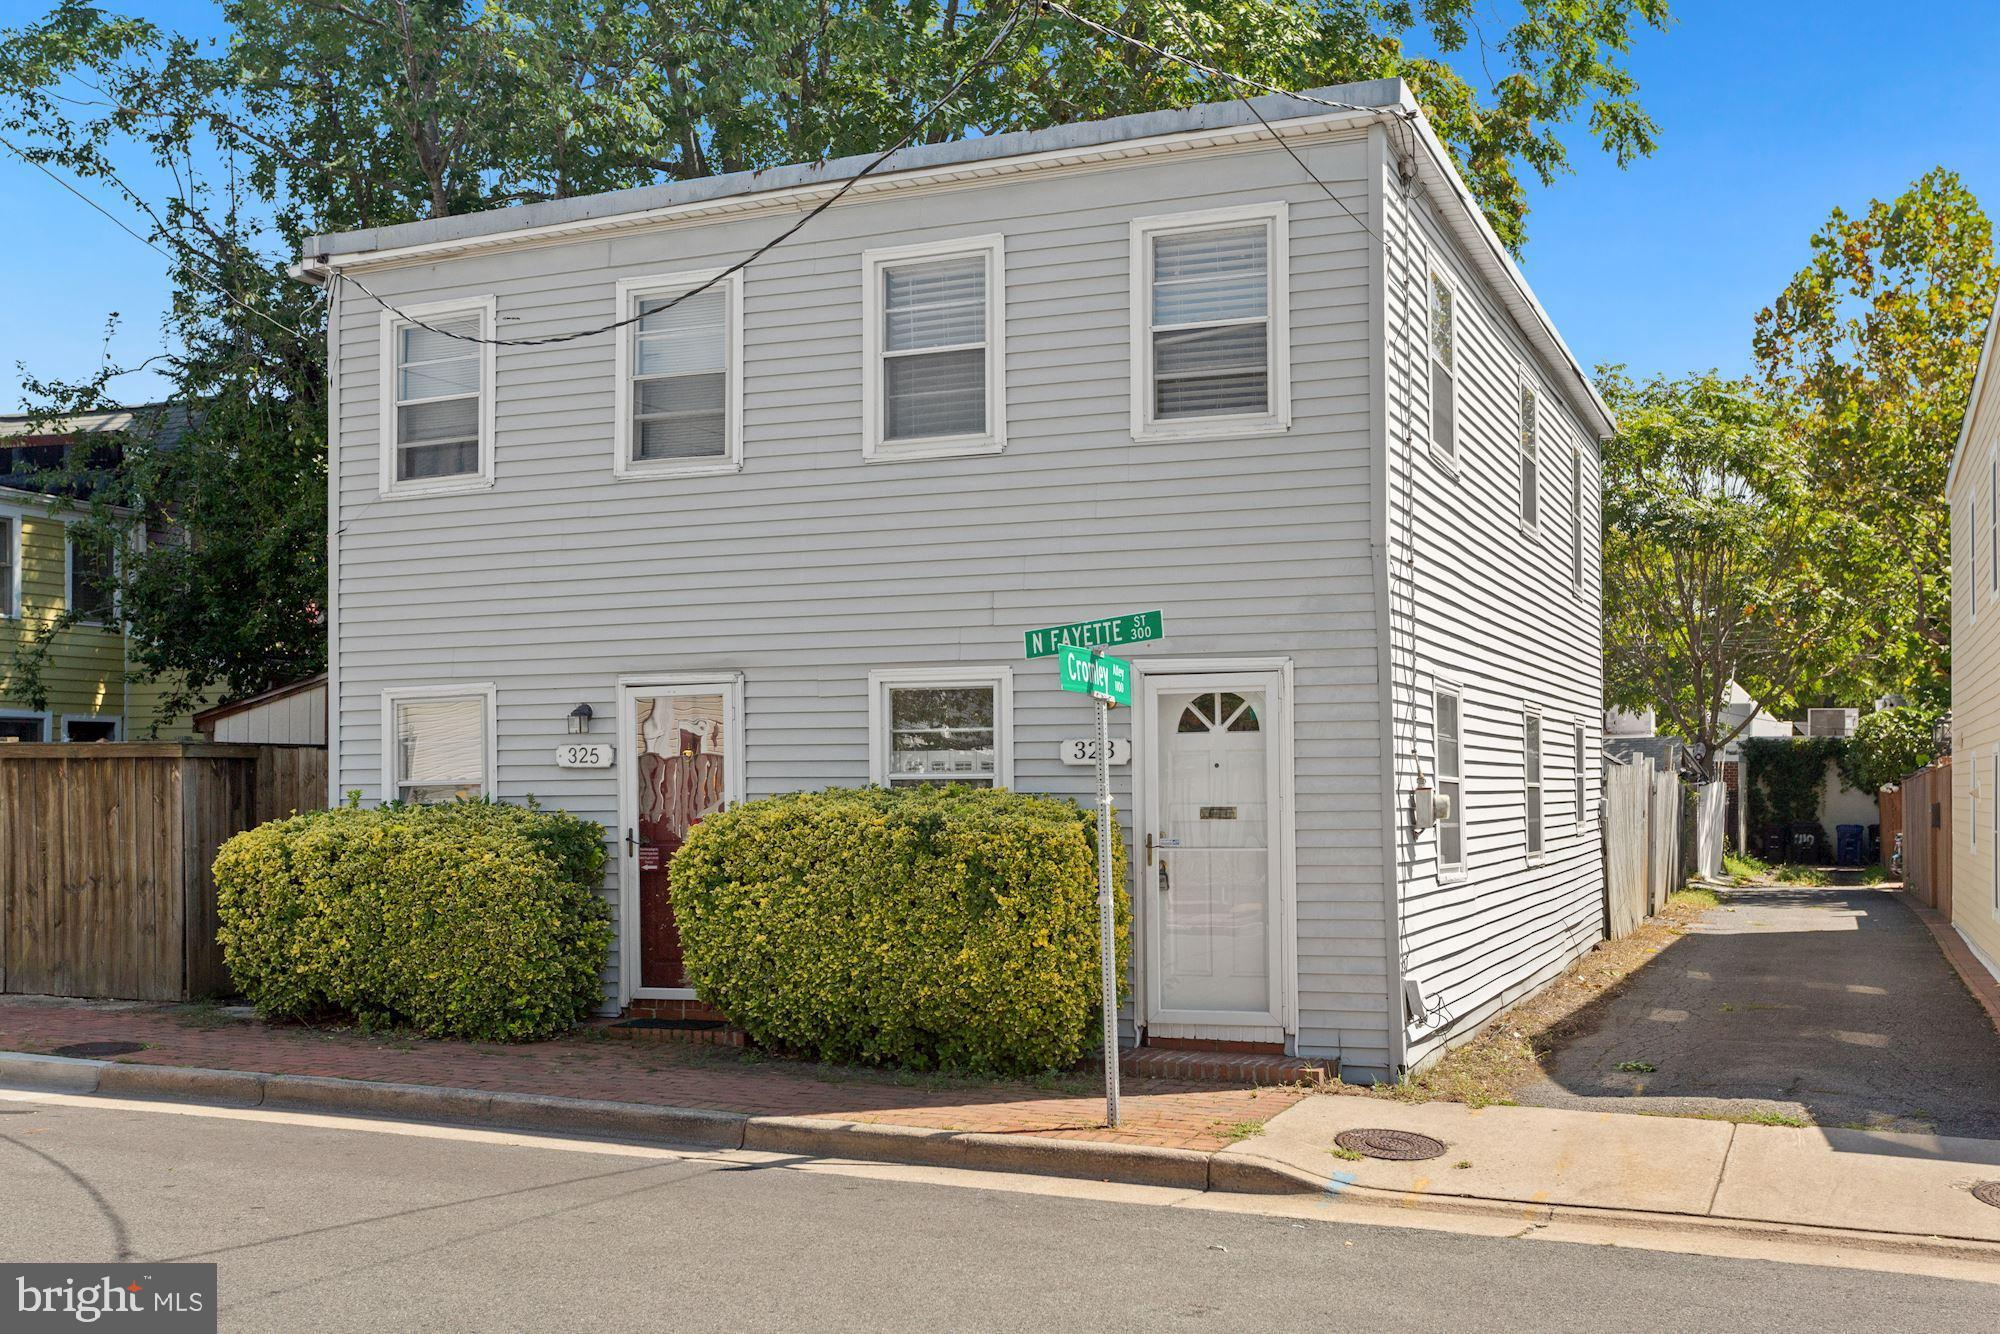 323 N Fayette Street, Alexandria, VA 22314